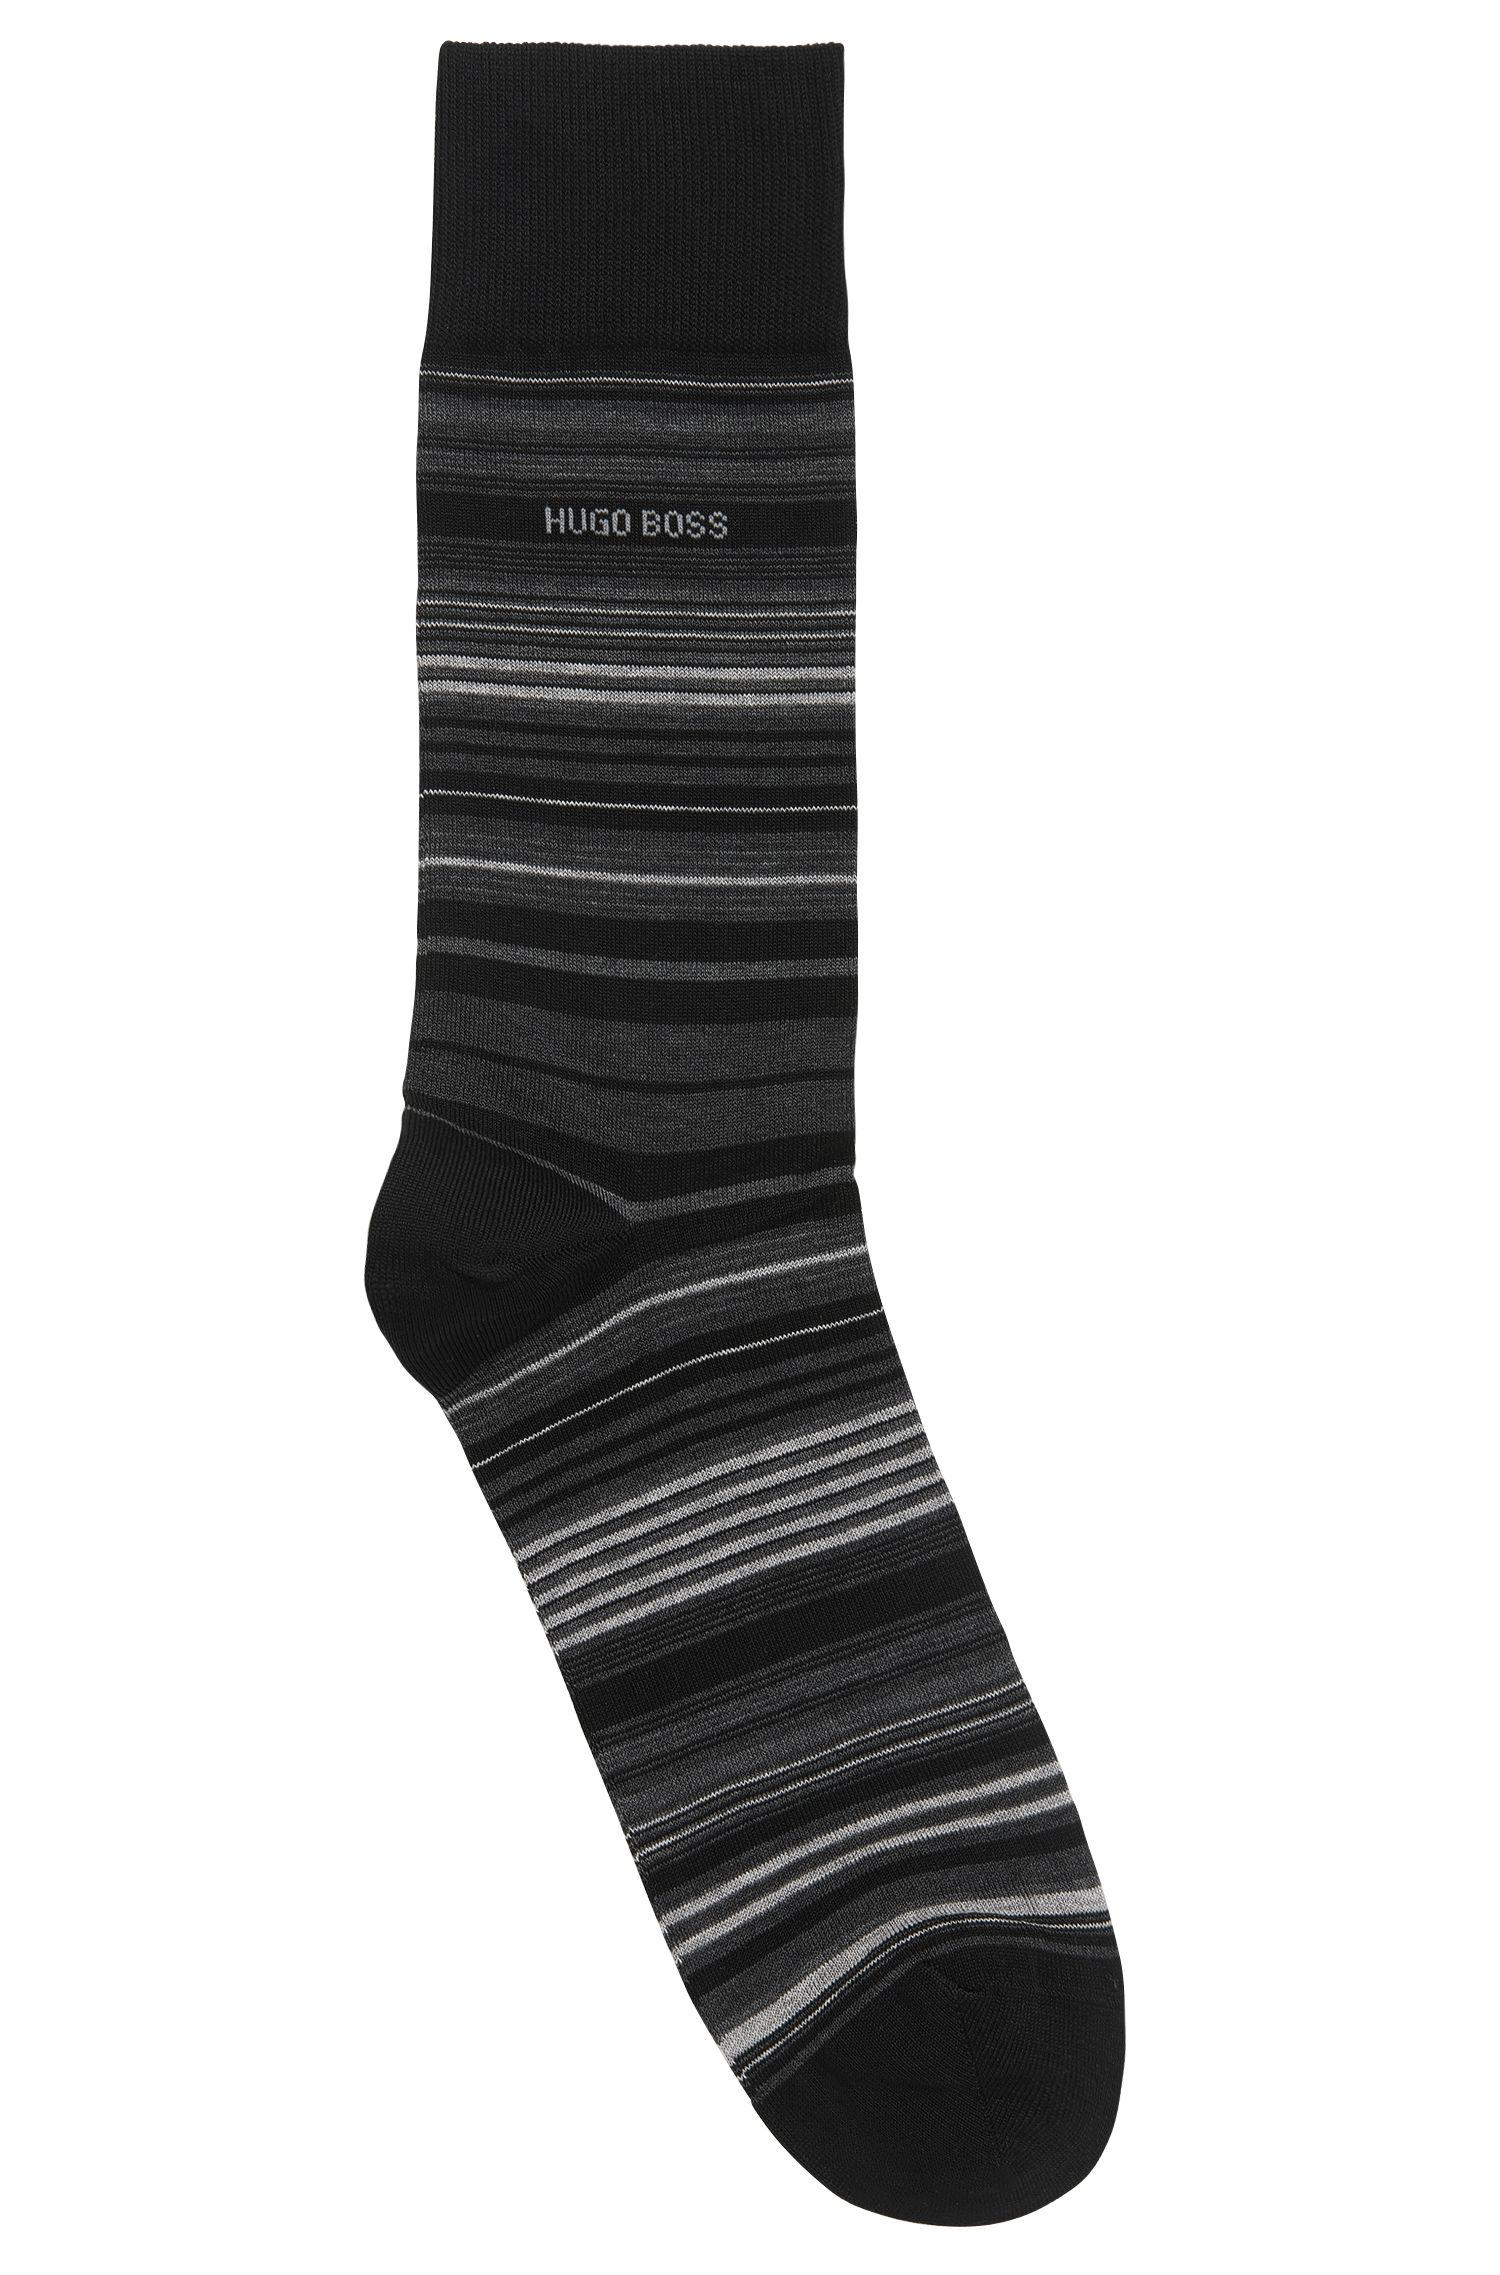 Striped Stretch Cotton Blend Socks | RS Multistripe US MC